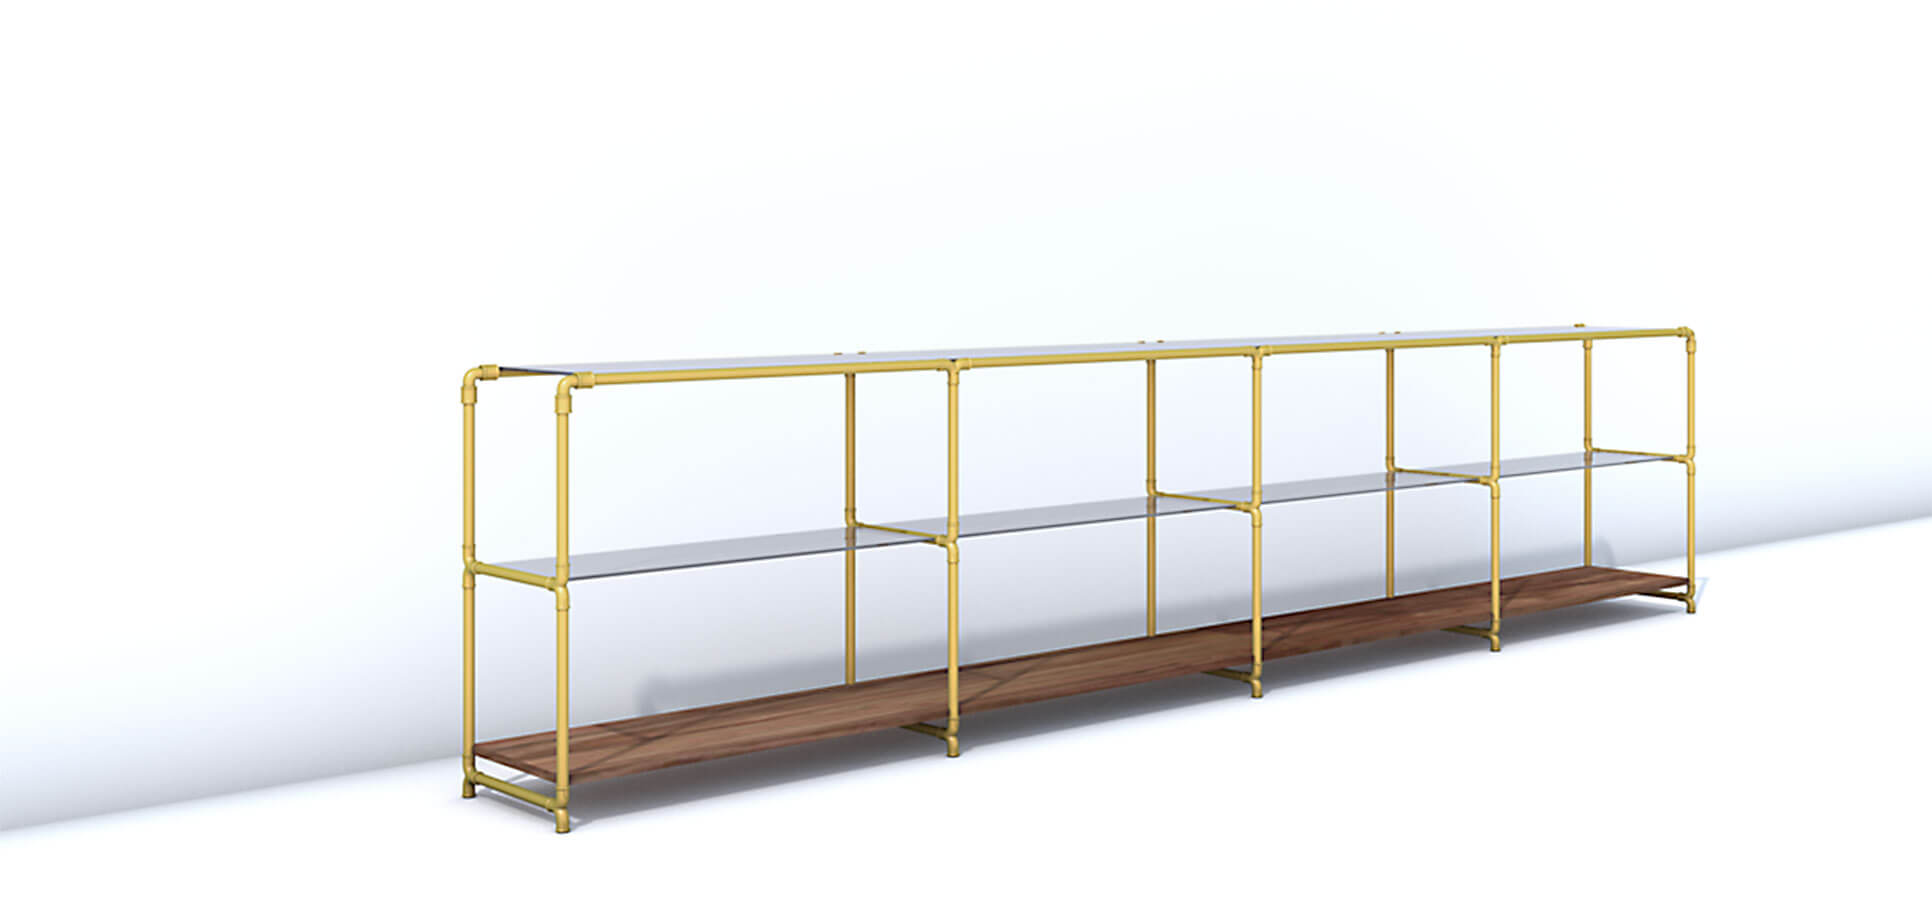 House-of-Chocolate-rohrfabrik-lowboard-sideboard-interieur-design-store-conzept-ladenbau-shop-ville-zuerich.jpg